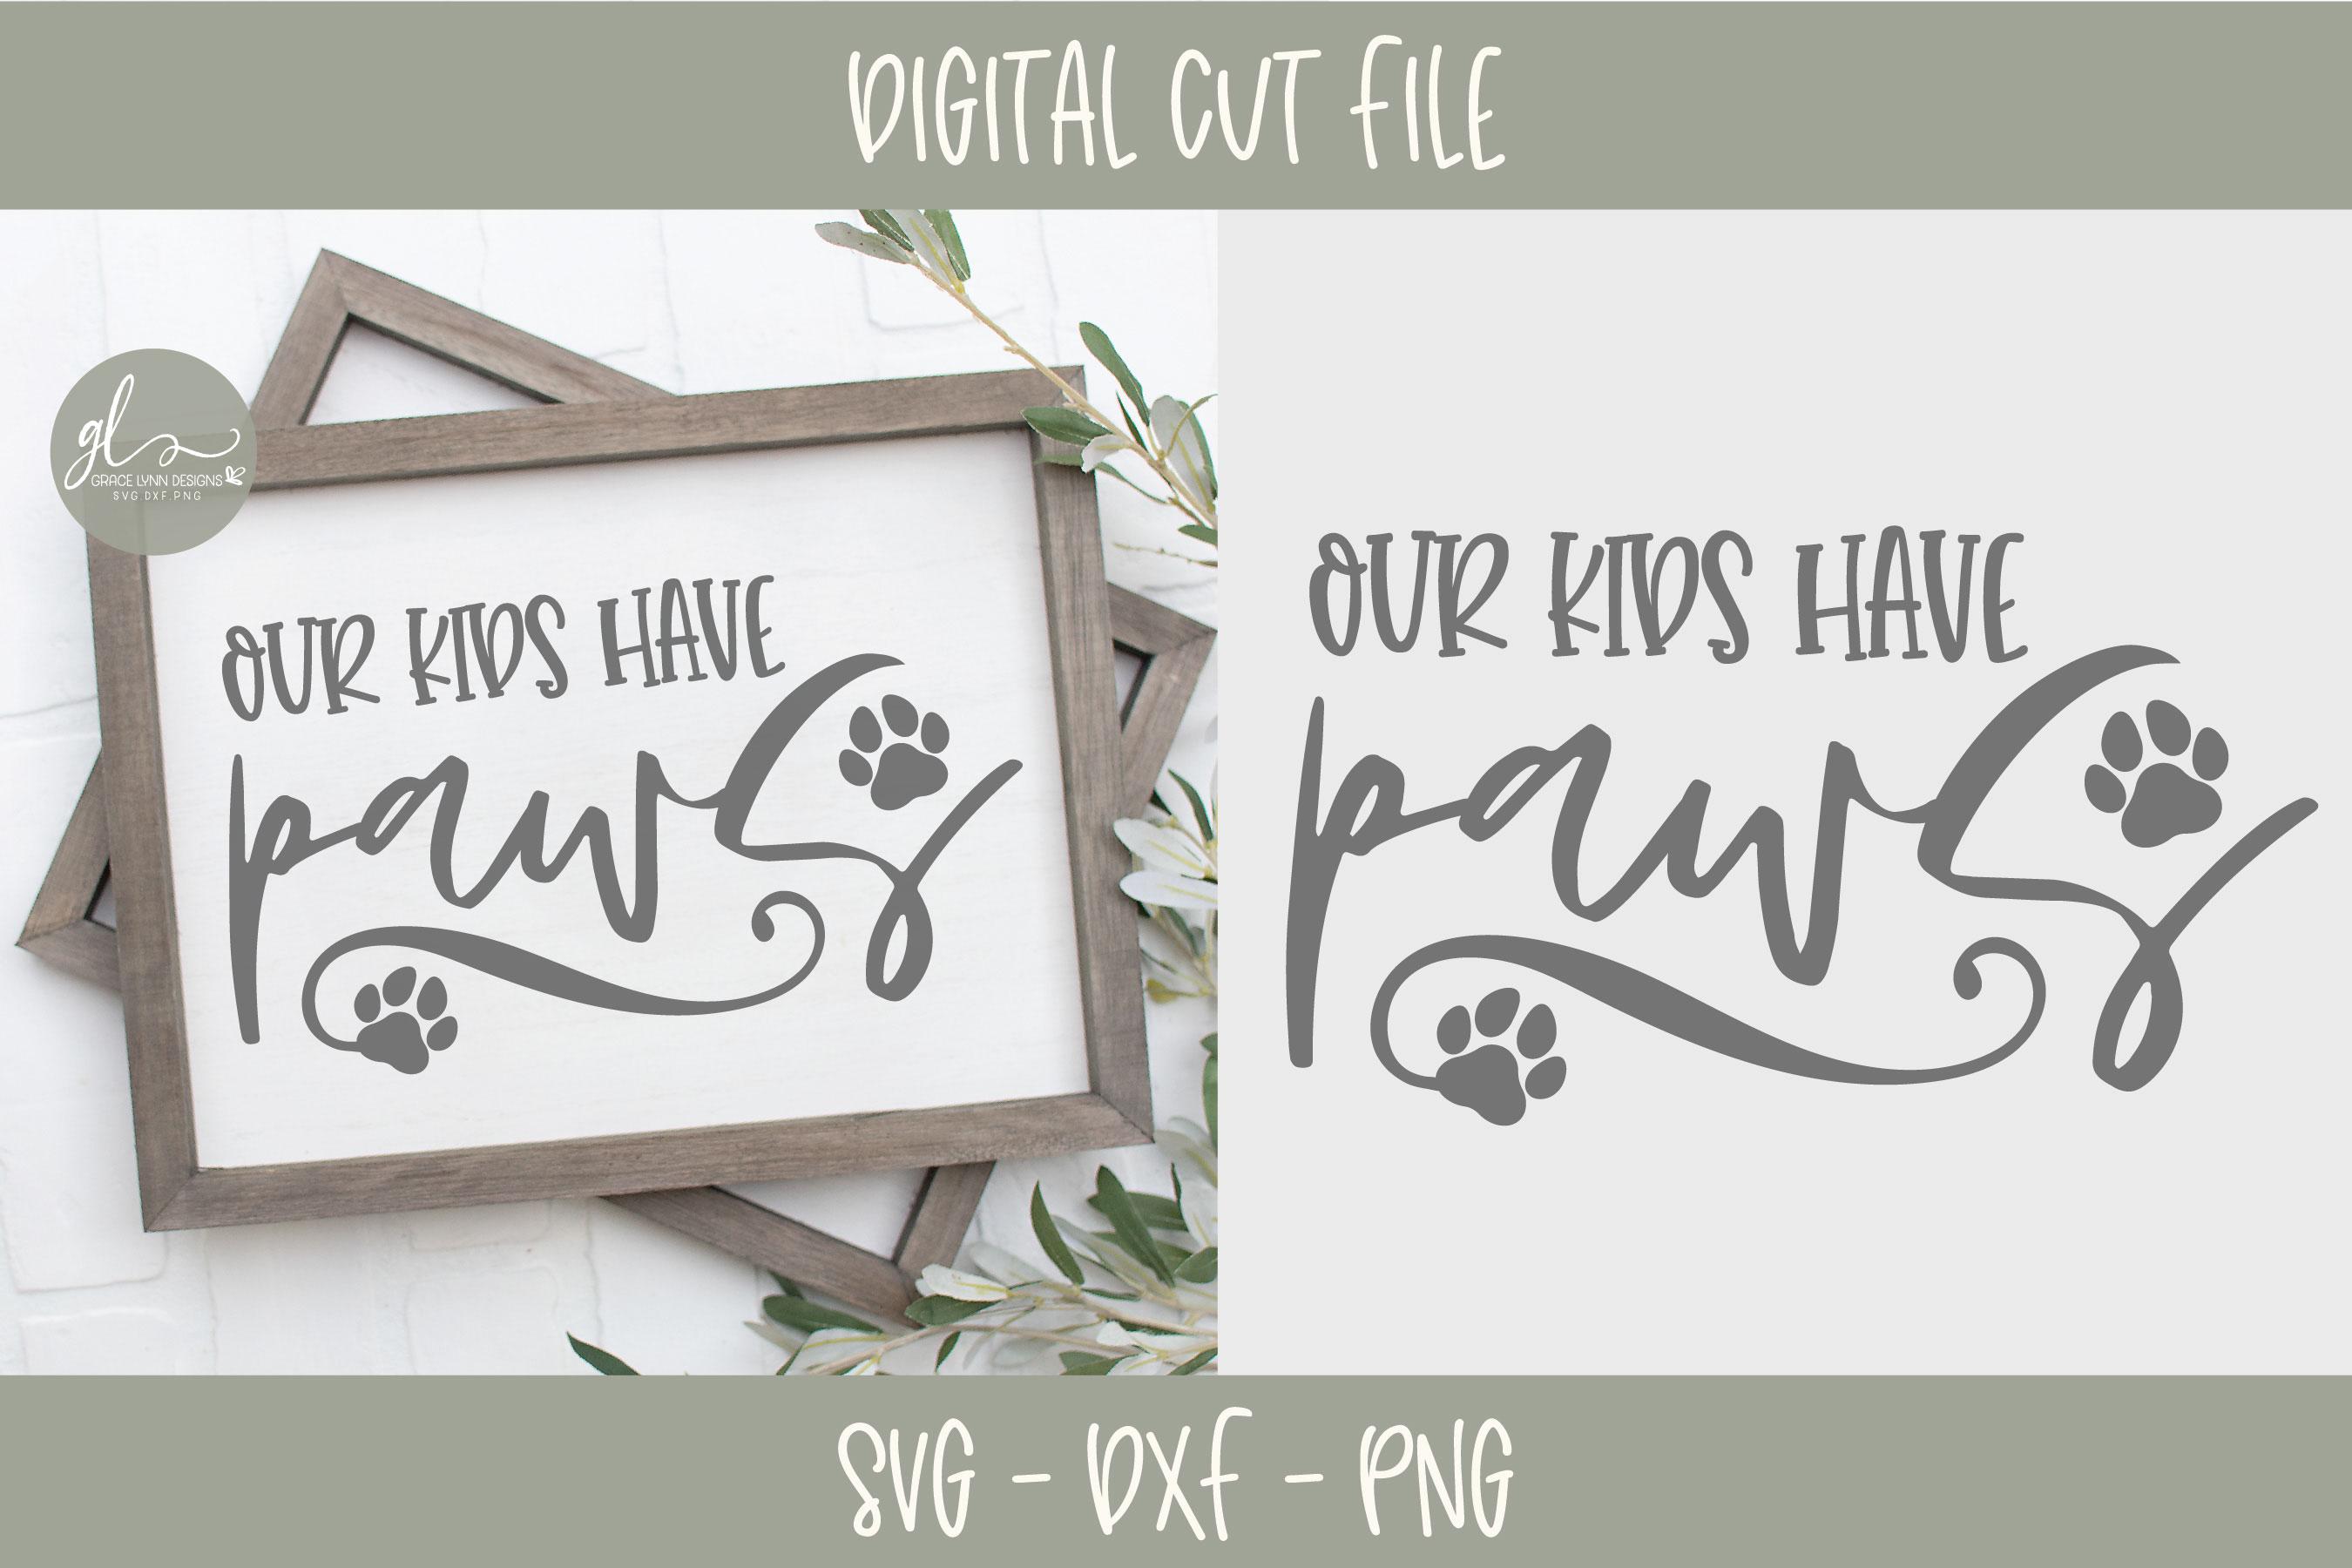 Dog Quotes Bundle Vol. 2 - 10 Designs - SVG Cut Files example image 5